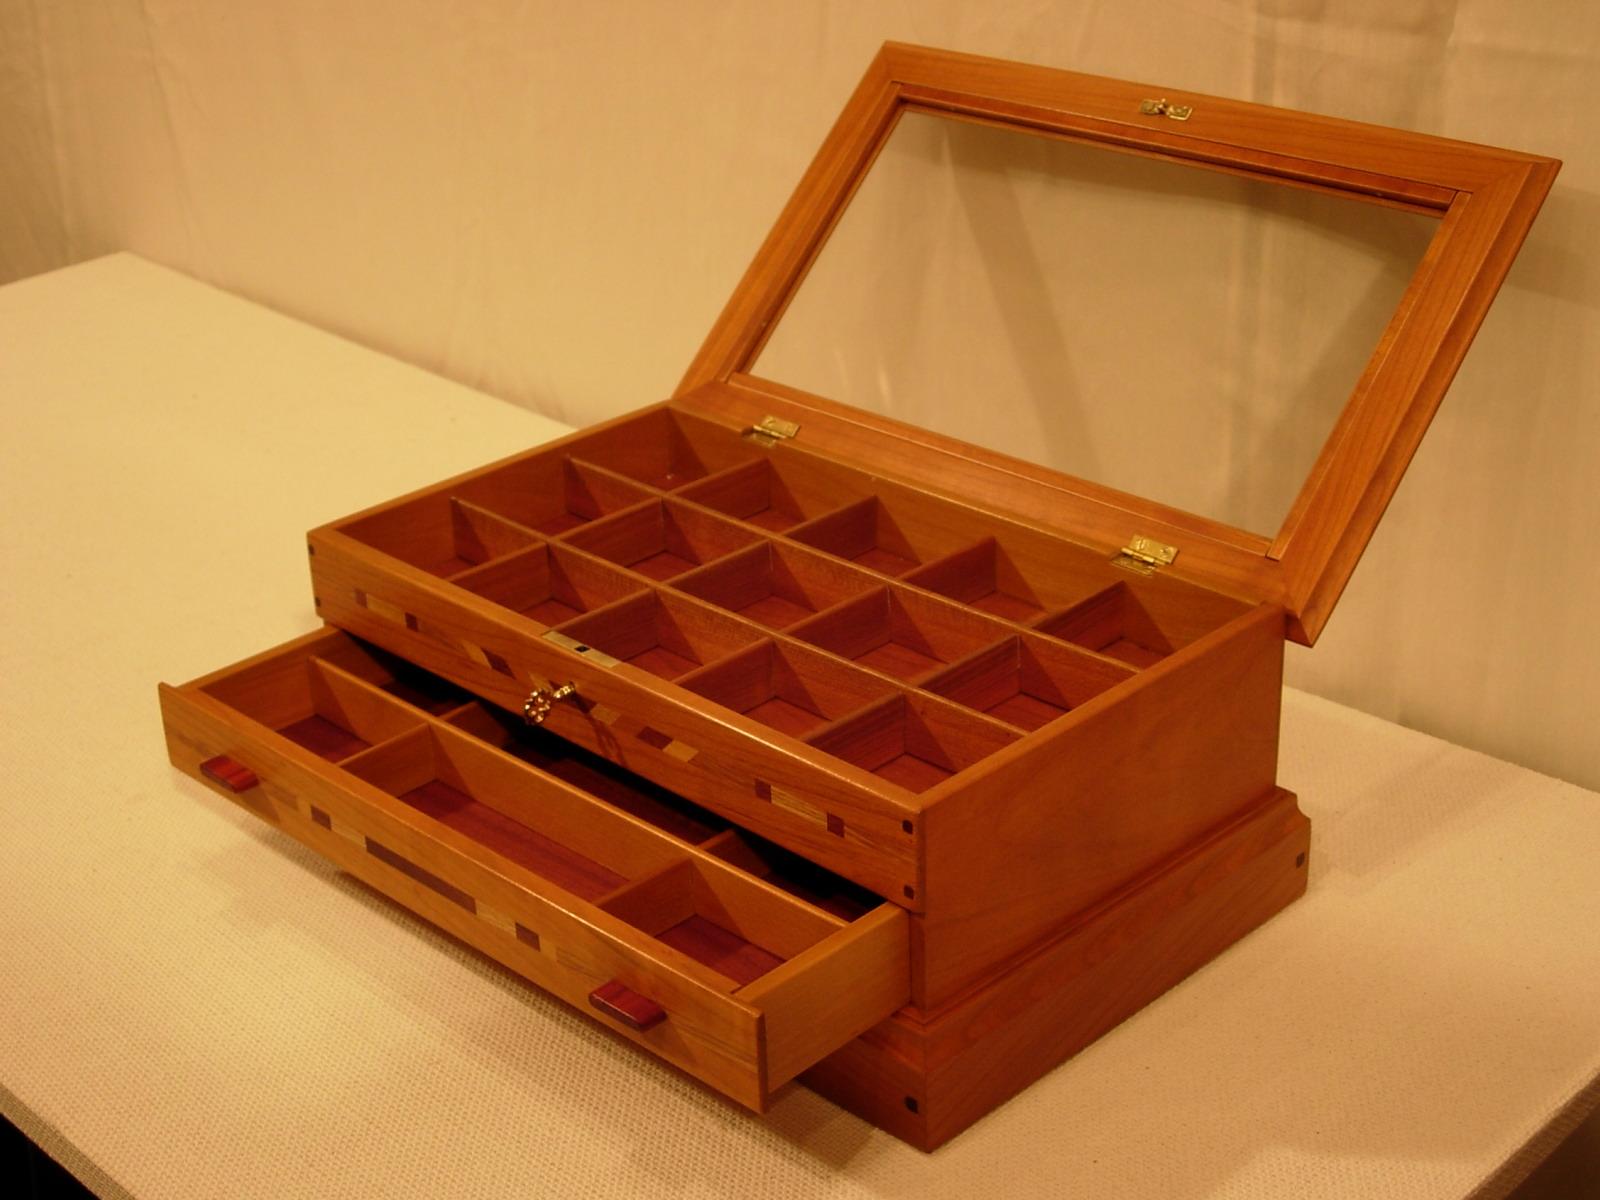 Sjuan ebanister a en madera en bilbao muebles artesanales - Muebles artesanales de madera ...